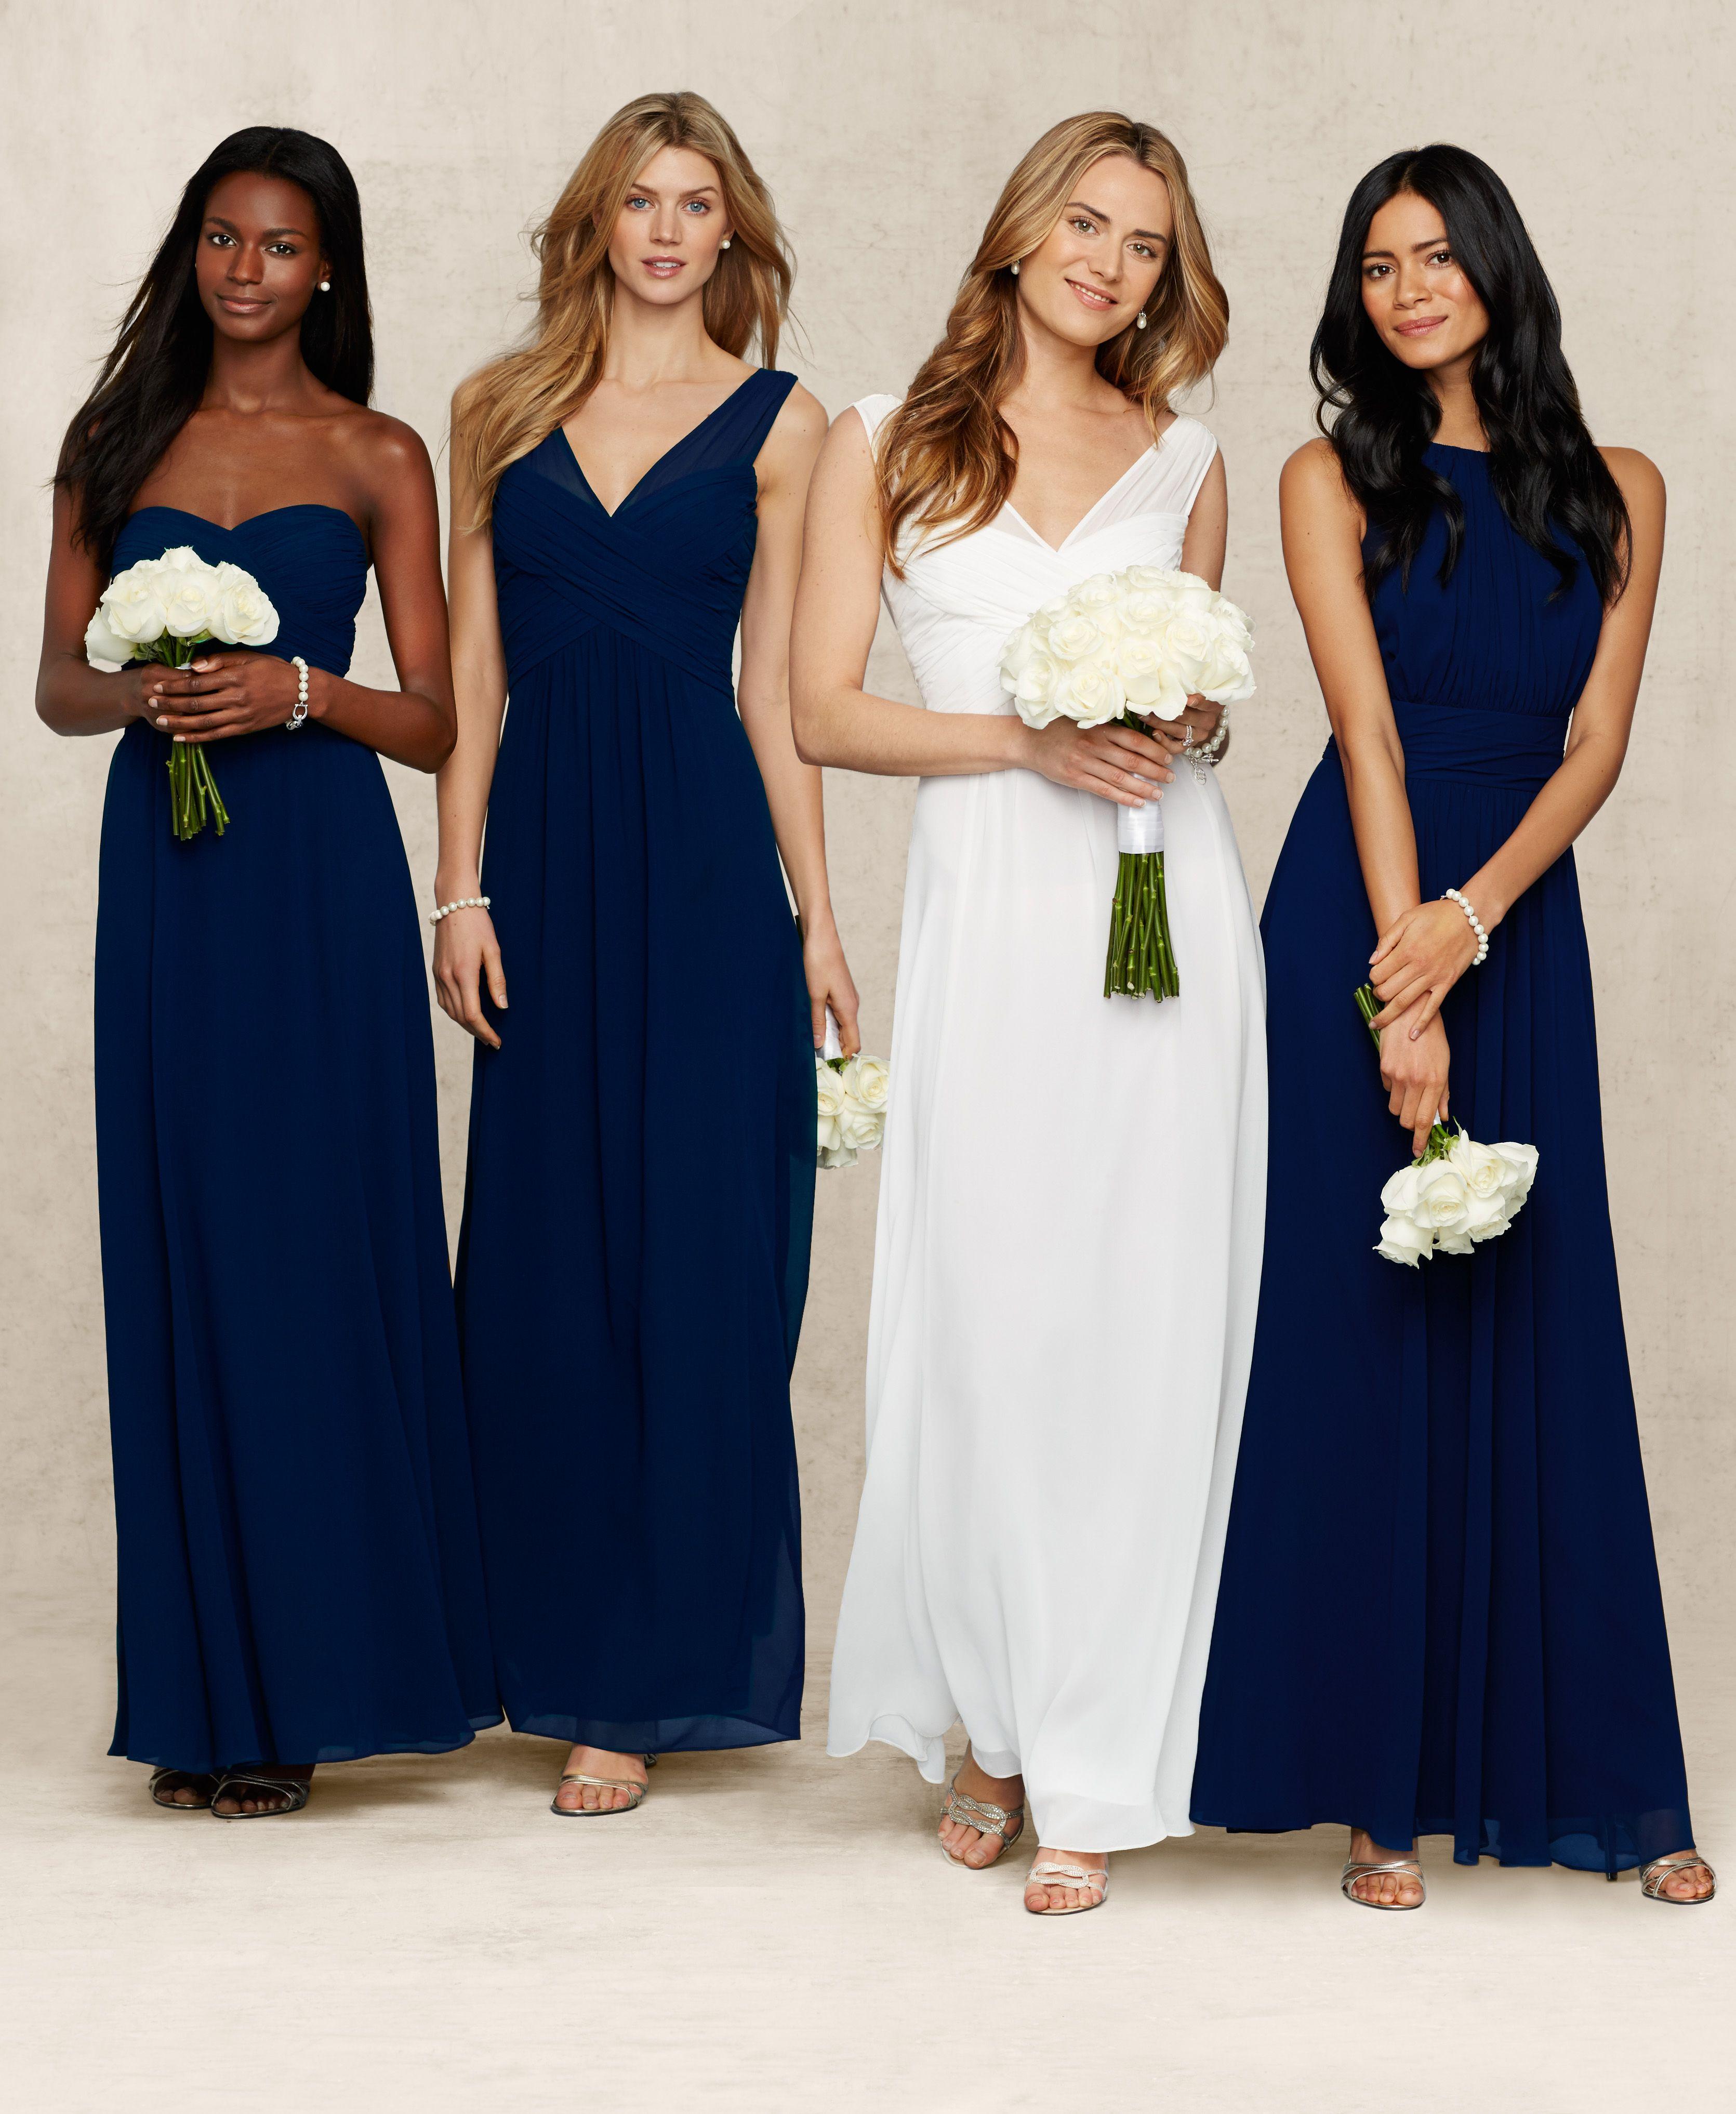 Lauren Ralph Lauren Wedding: Mix and match navy blue bridesmaid ...